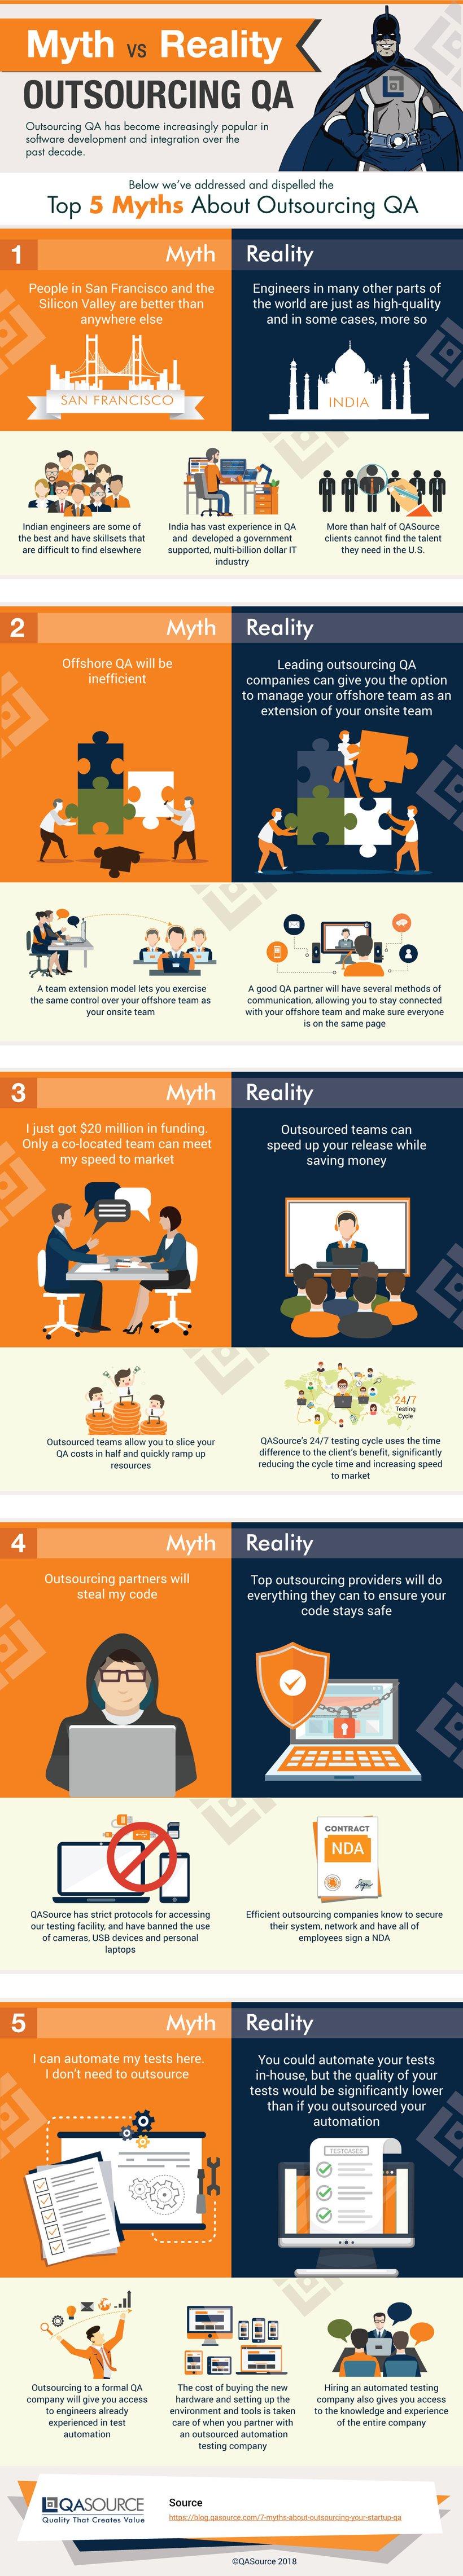 Myth vs. Reality: Outsourcing QA (Infographic)